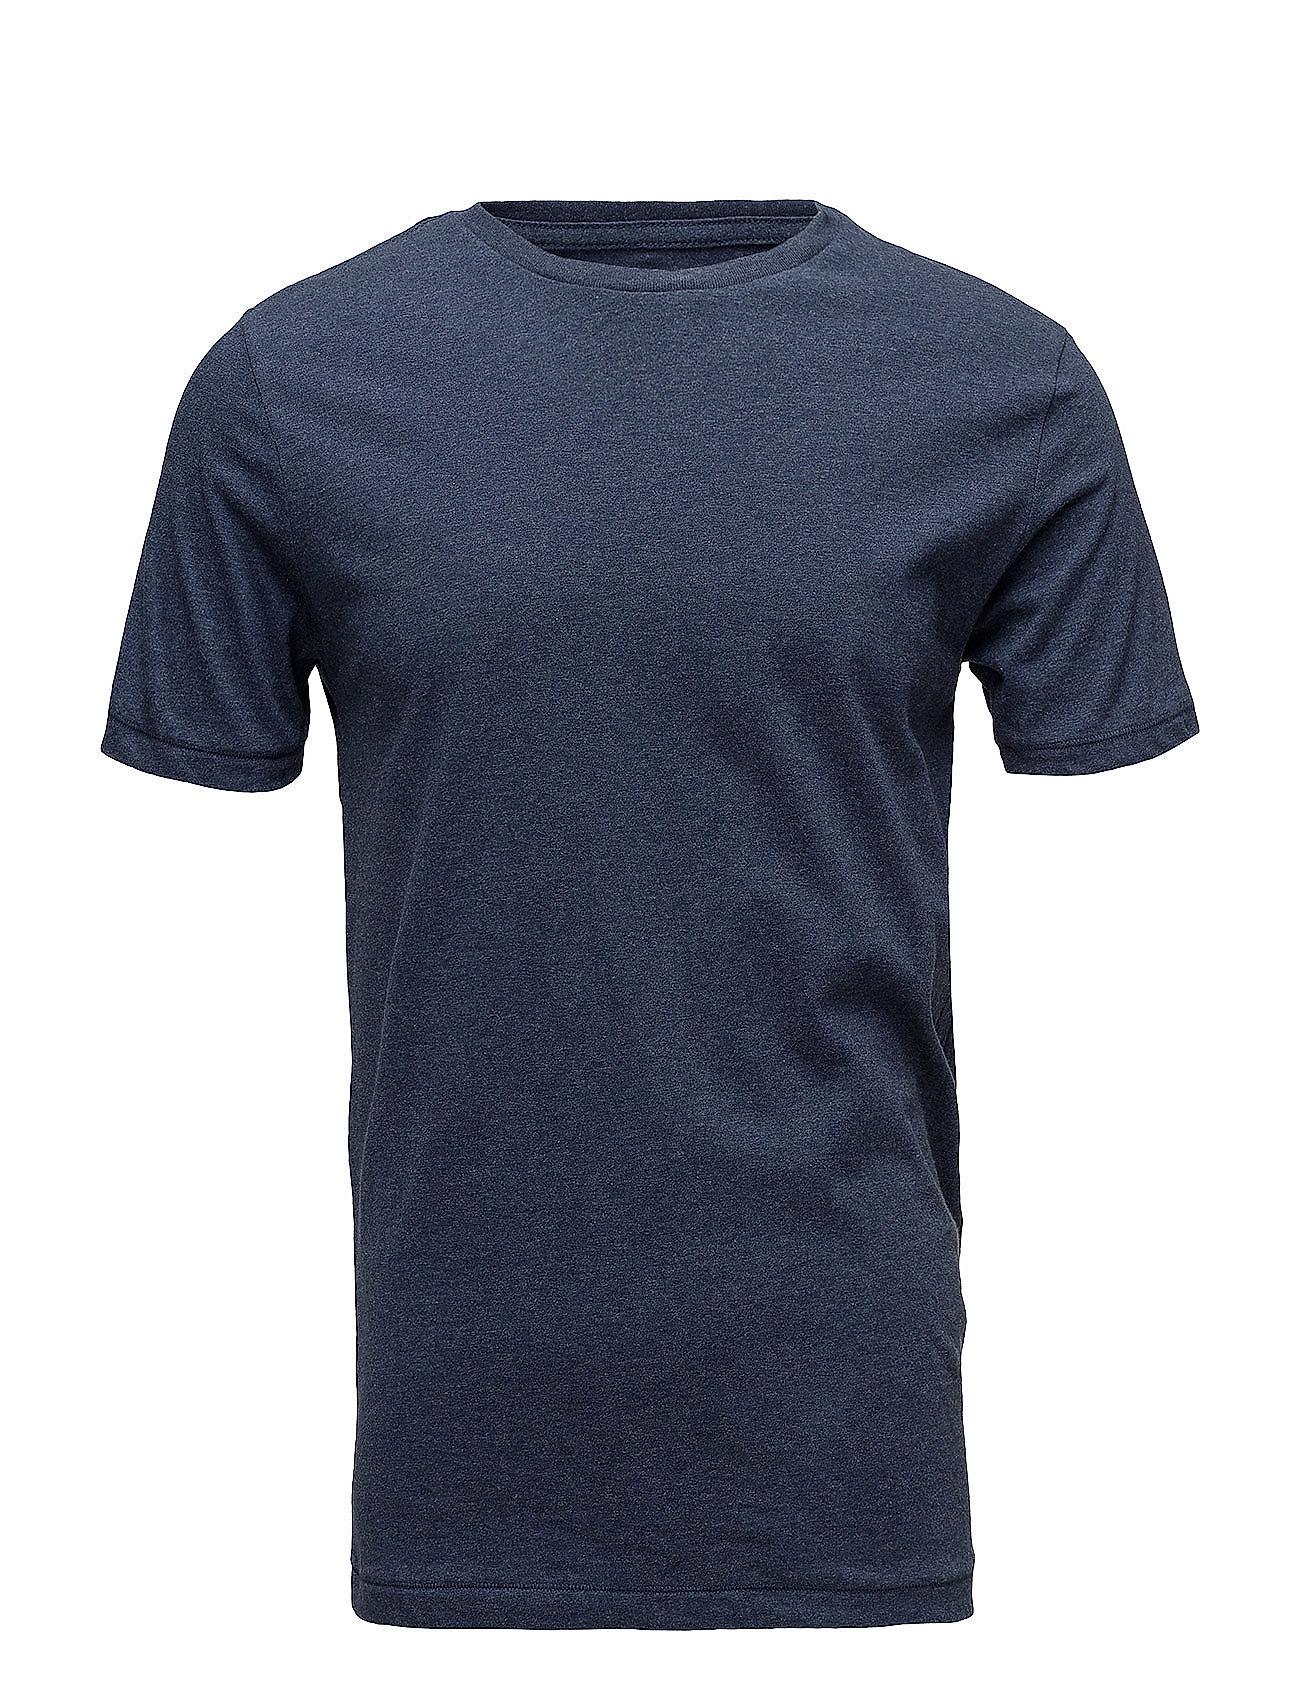 Knowledge Cotton Apparel ALDER basic tee - GOTS/Vegan - INSIGNA BLUE MELANGE